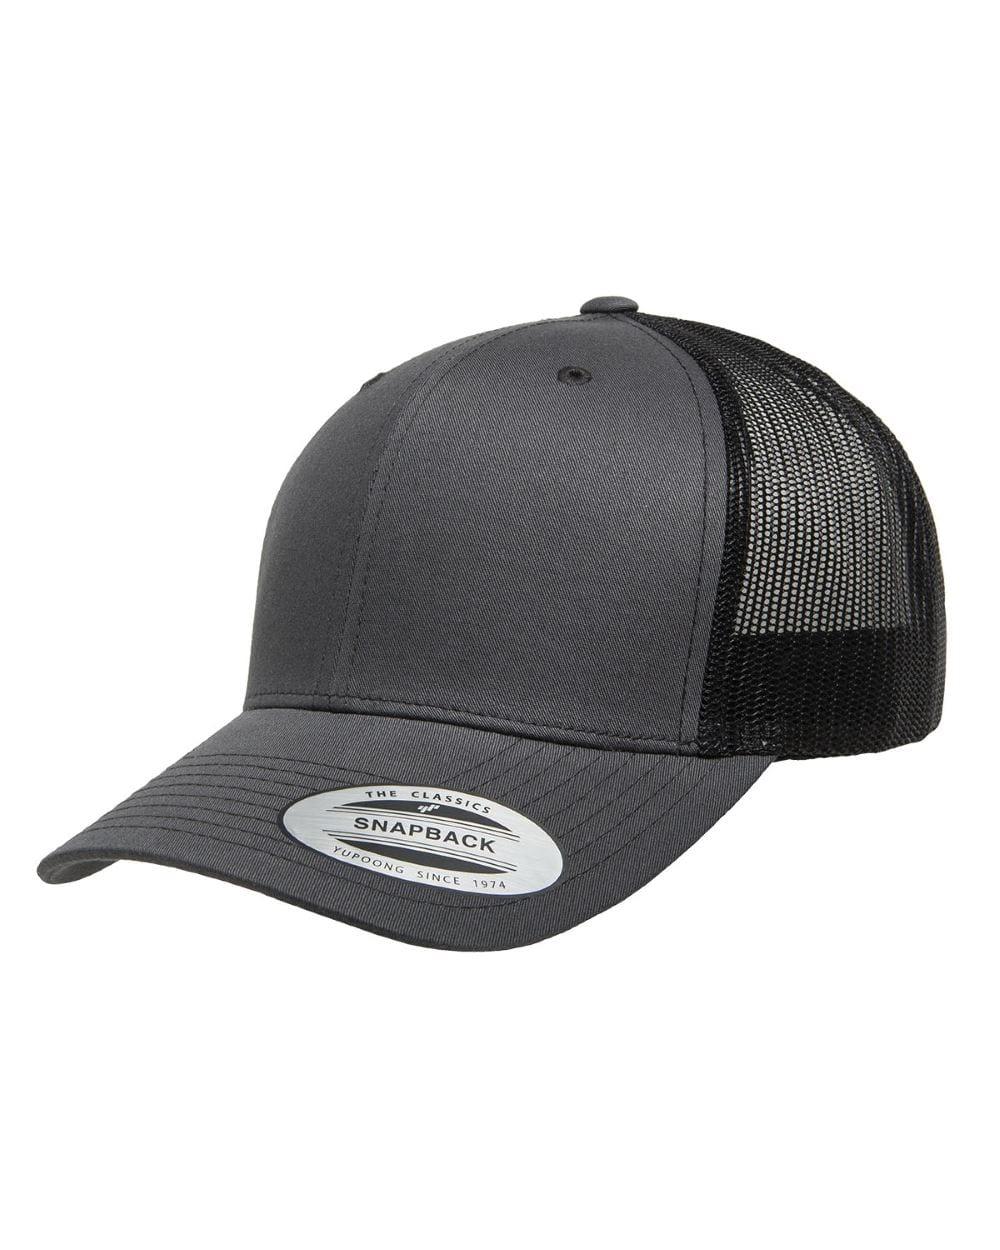 919c2ece26db5 bulk custom shirts - custom hats yupoong 6606 custom retro trucker snapback  cap charcoal black